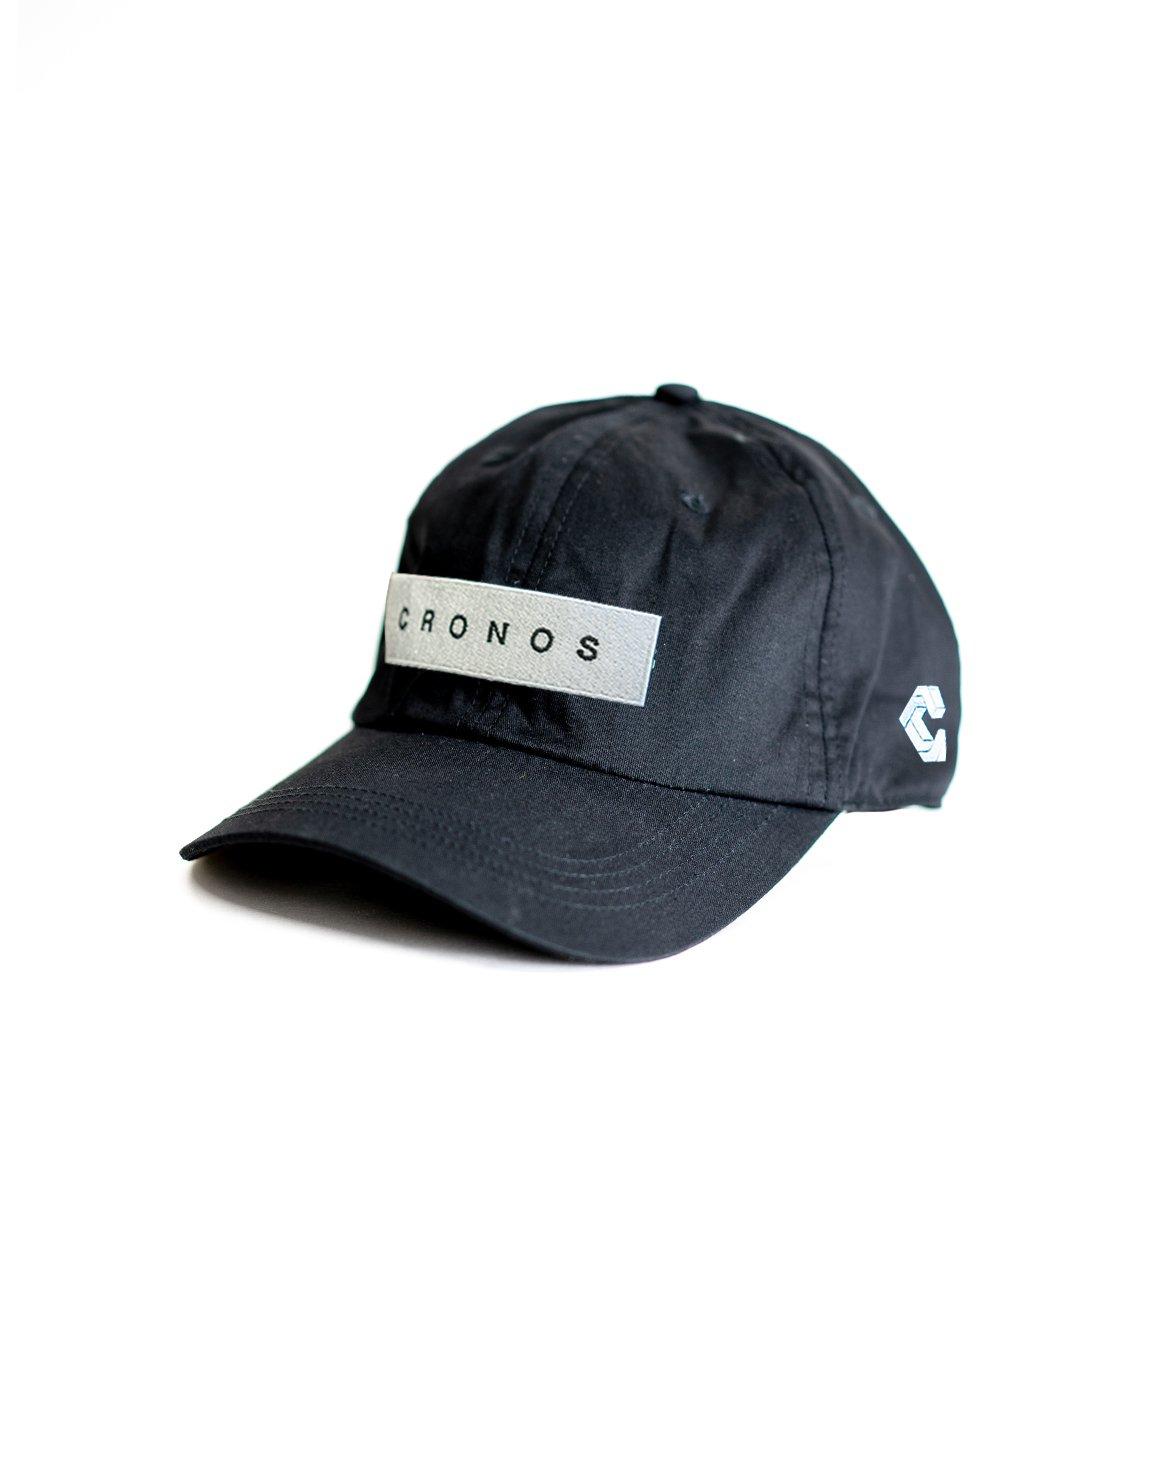 CRONOS BOX LOGO CAP 【BLACK】